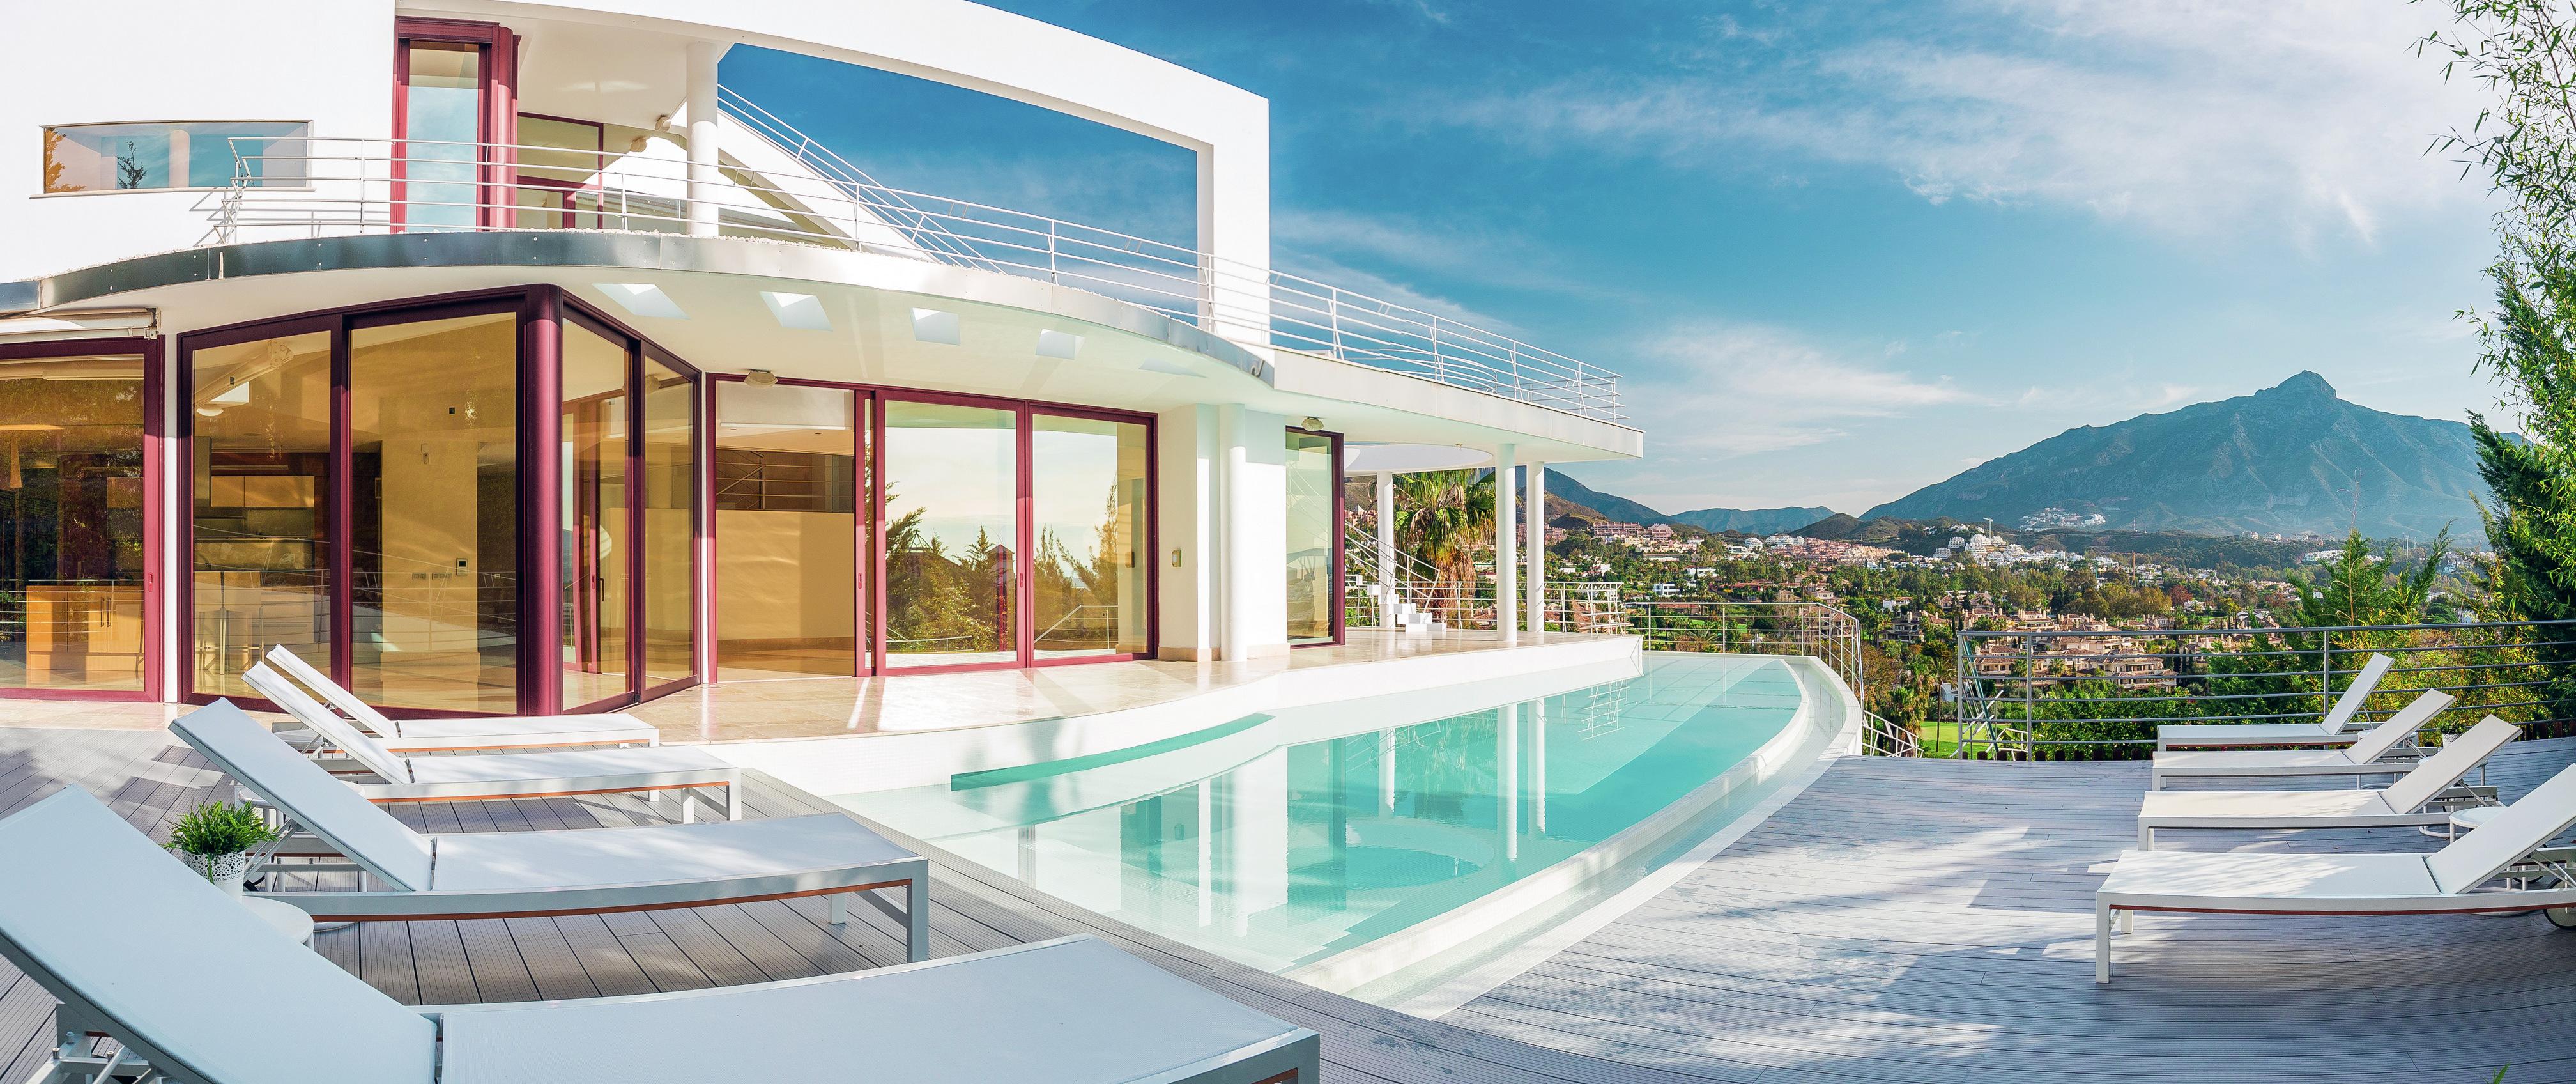 Villas modernas en Marbella